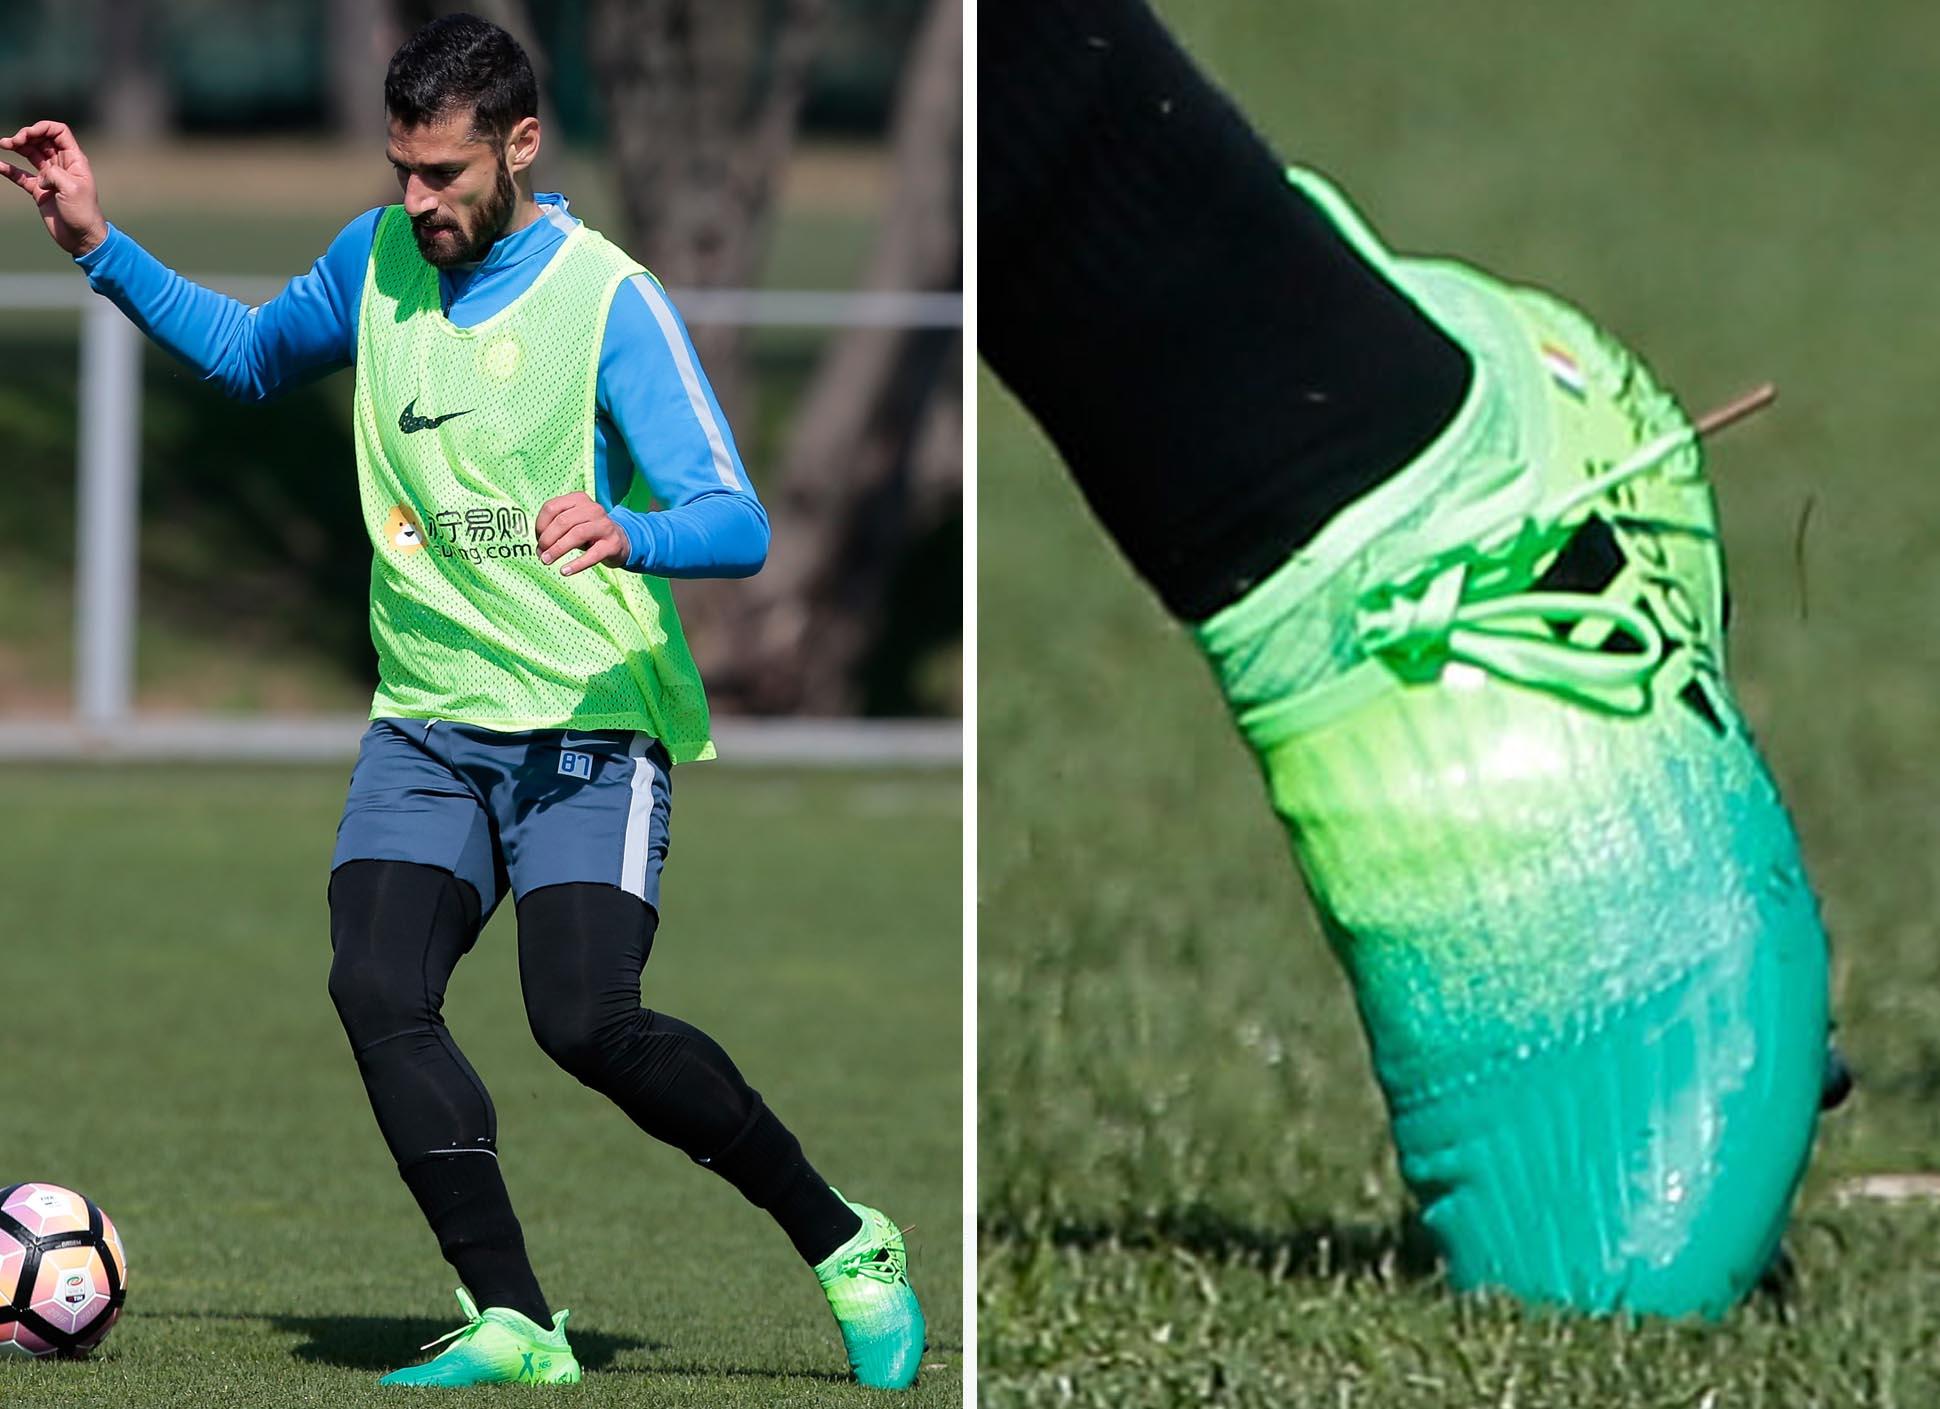 Antonio Candreva Trains In Upcoming adidas Colourway - SoccerBible. c39be1030